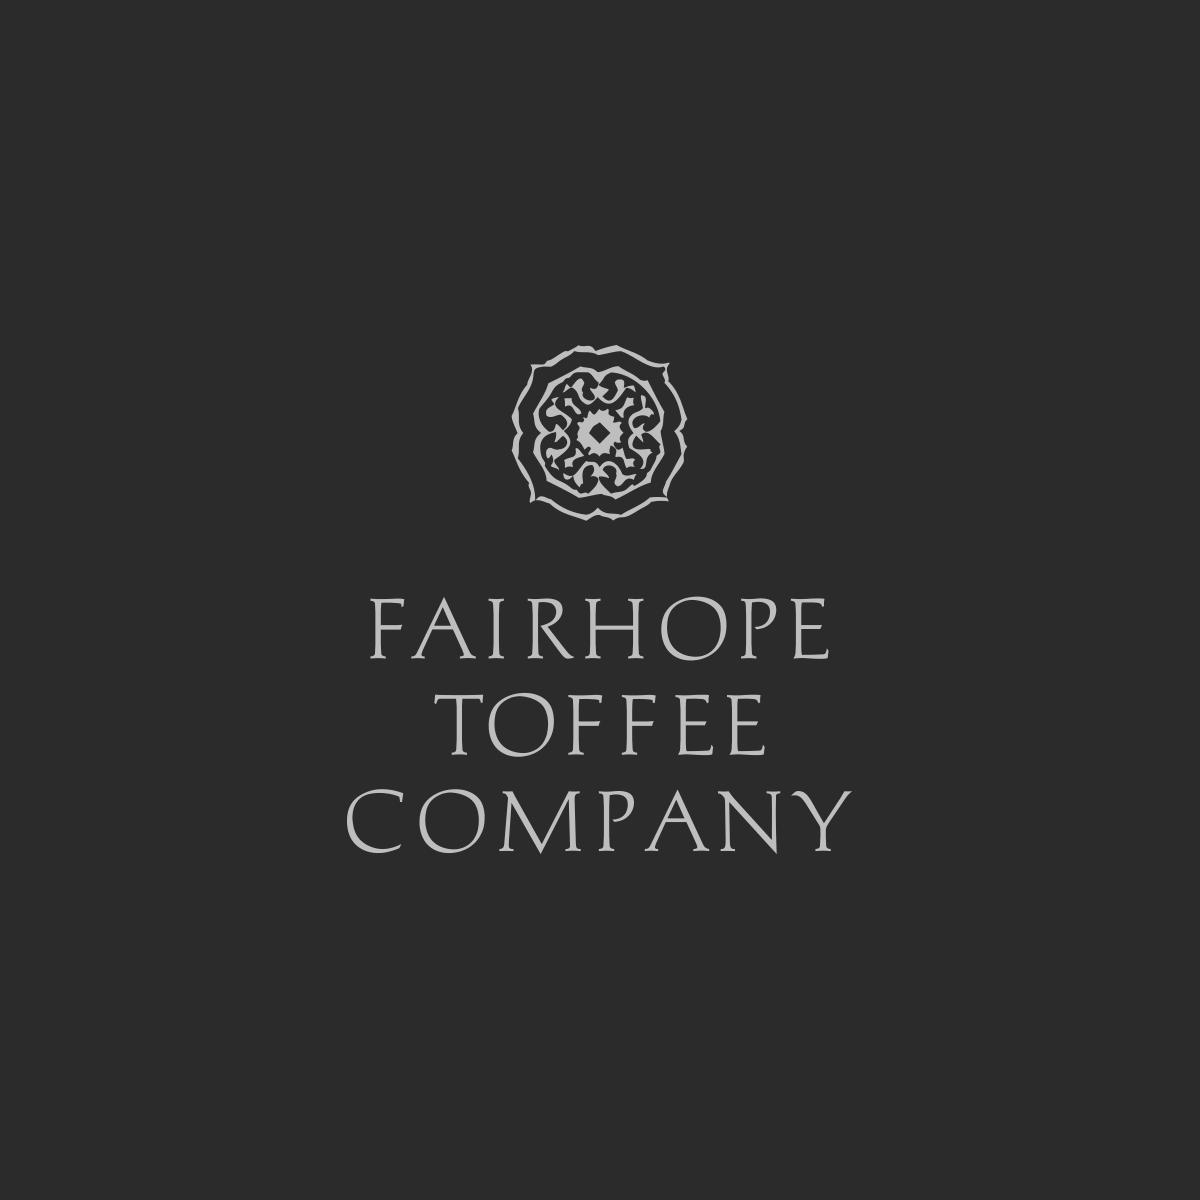 Fairhope Toffee Co.